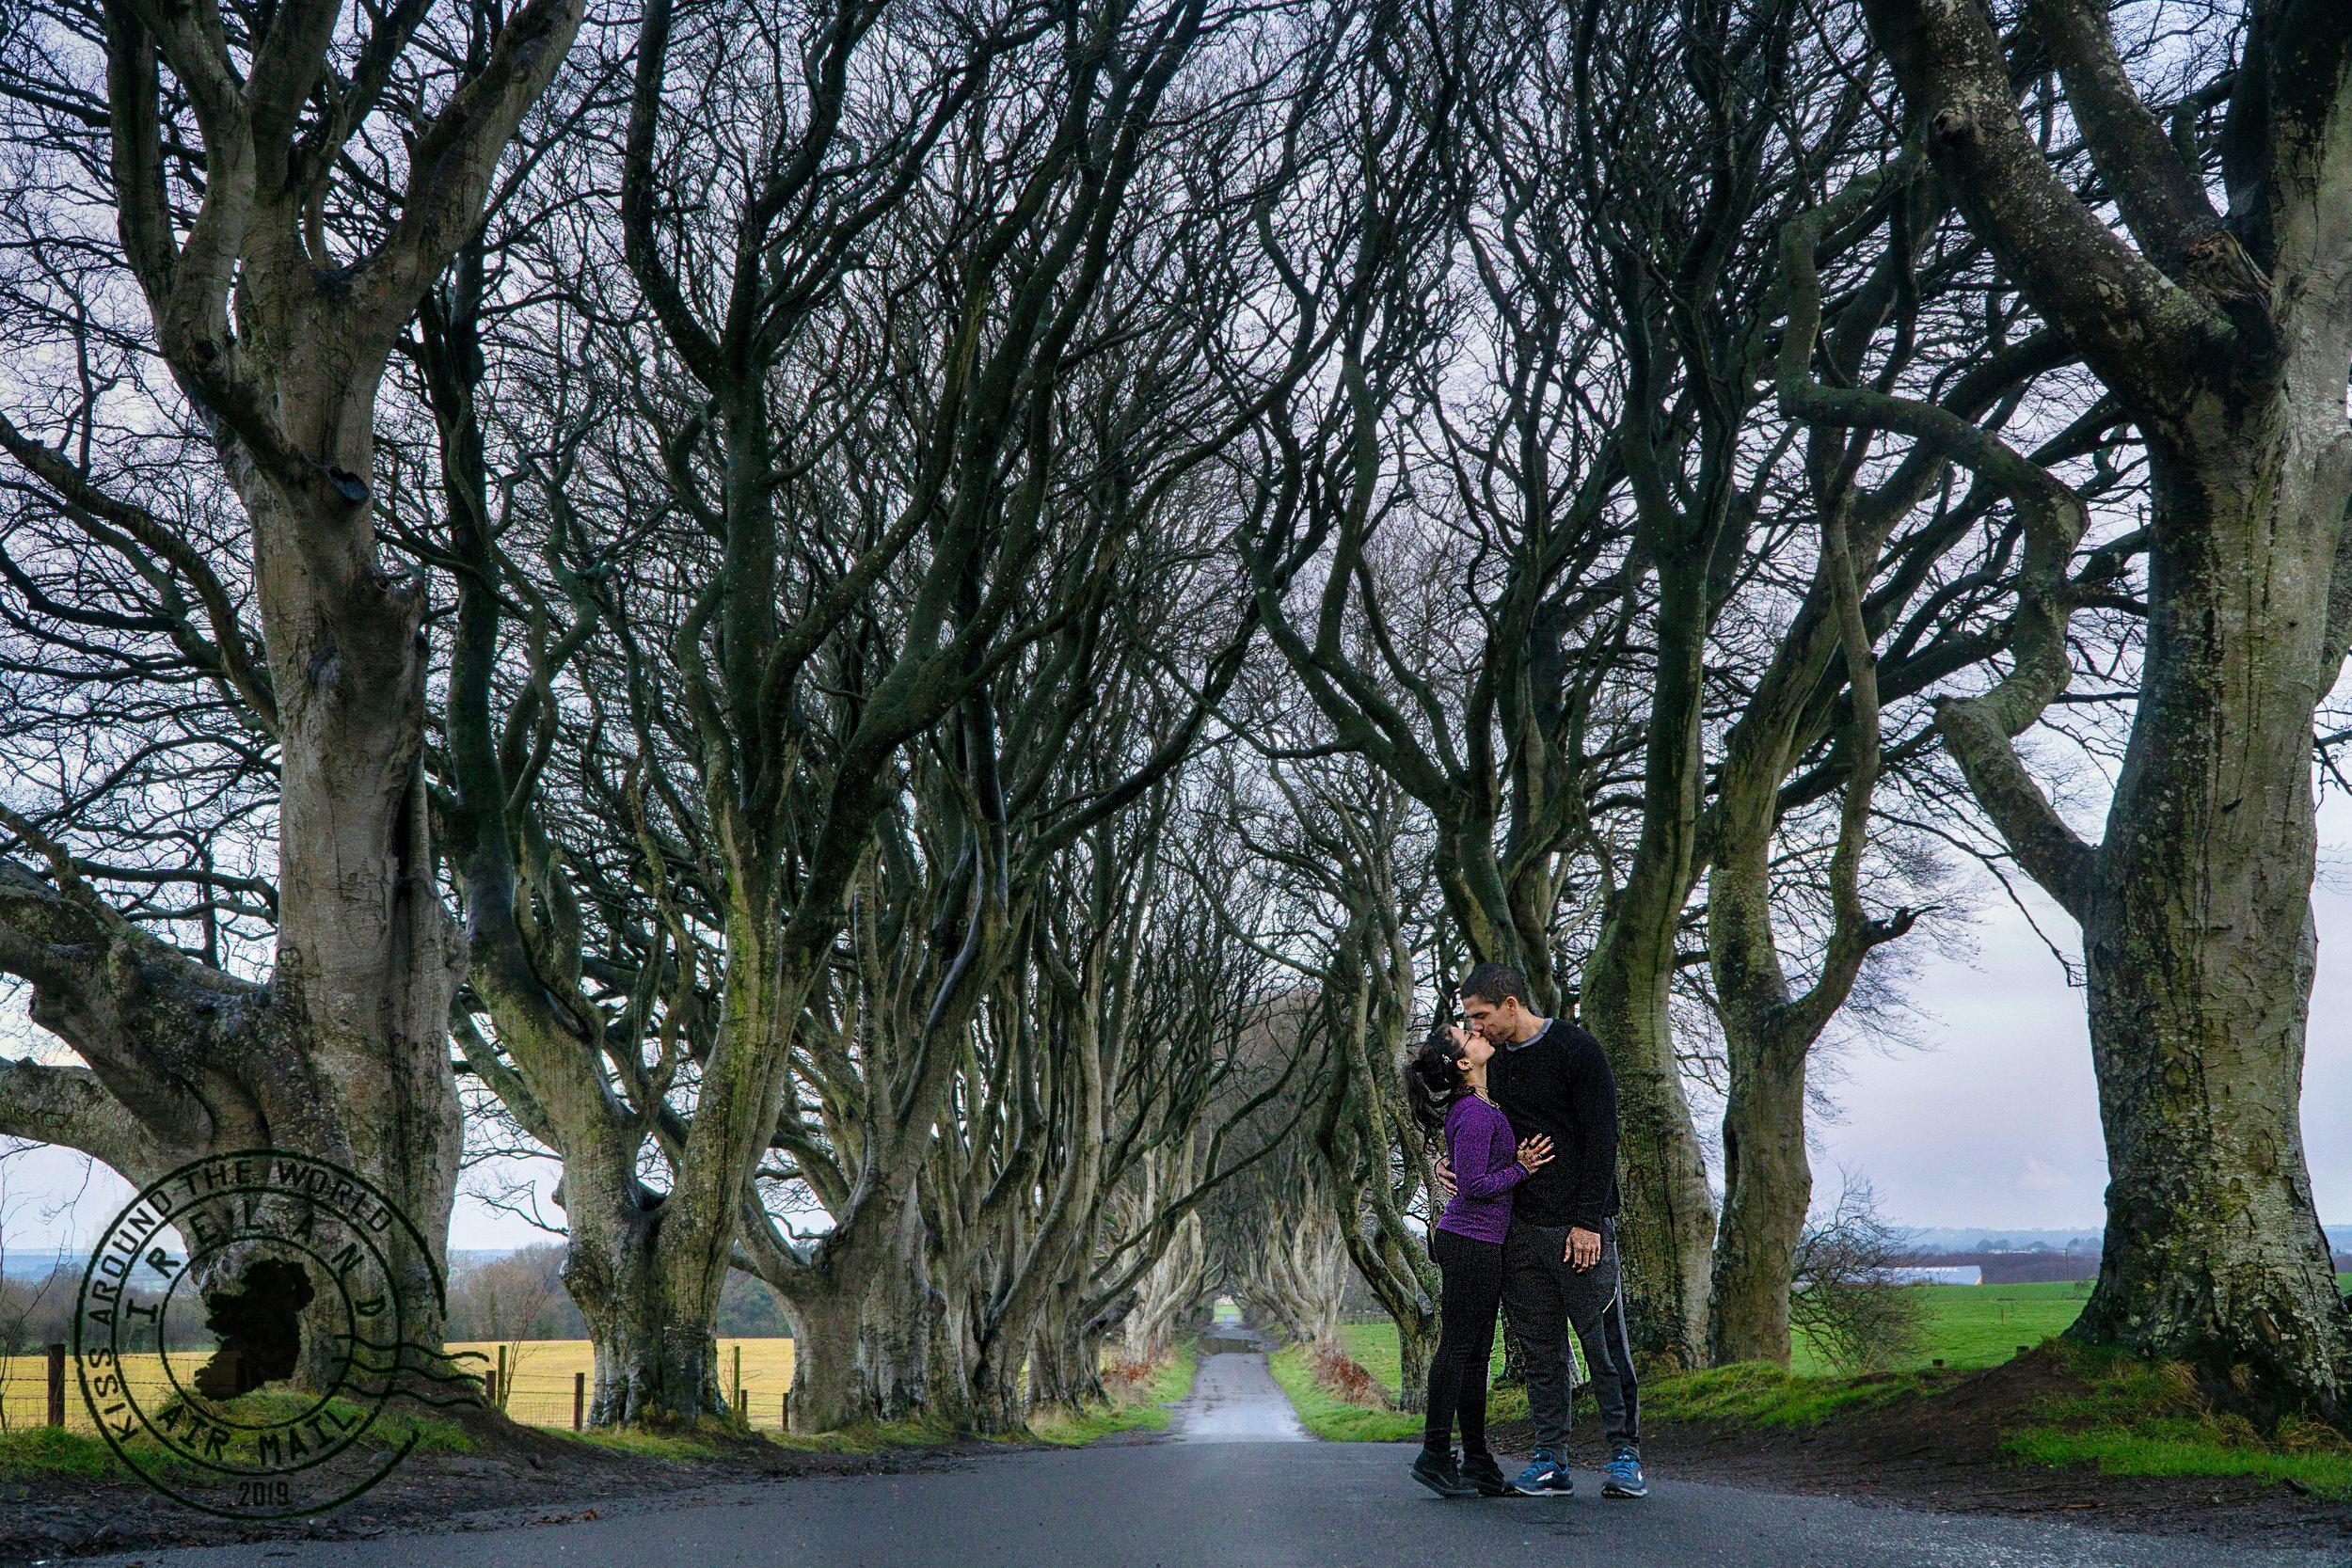 northern_Ireland_the_dark_hedges_vickugood_kiss-around-the-worldtravel_photographysm.jpg